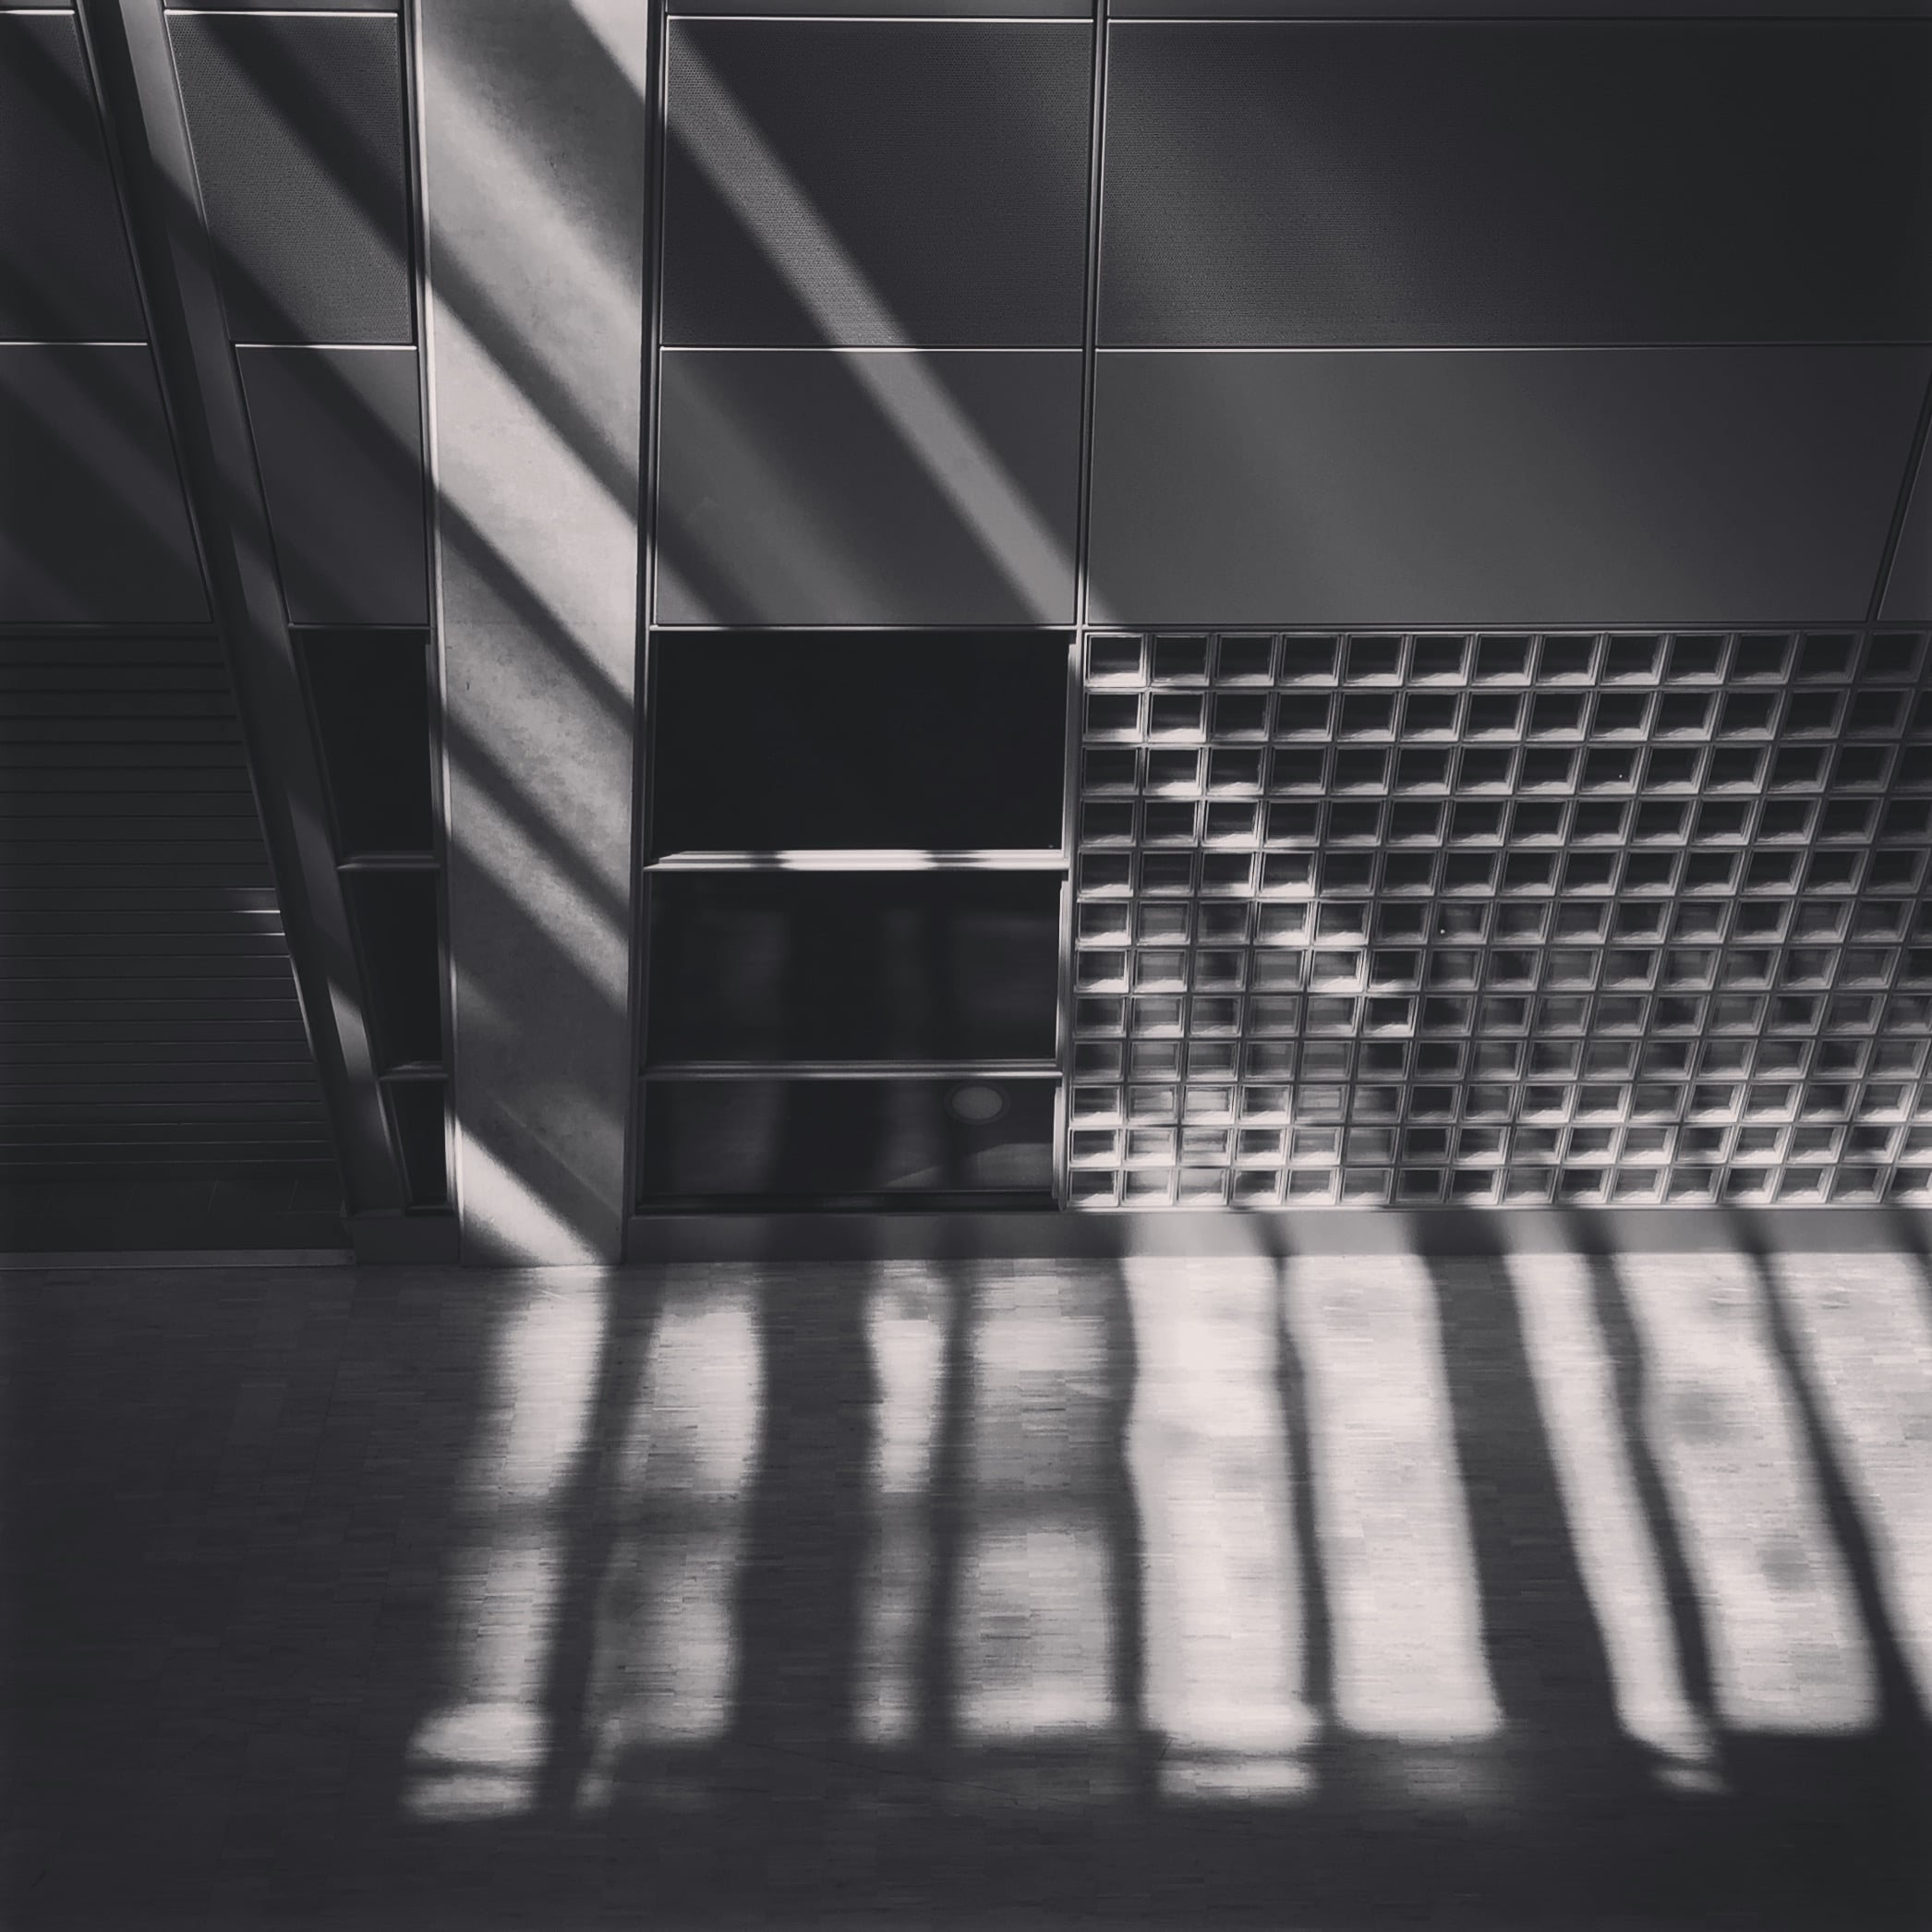 'Bars of Light -Schiphol' 2015